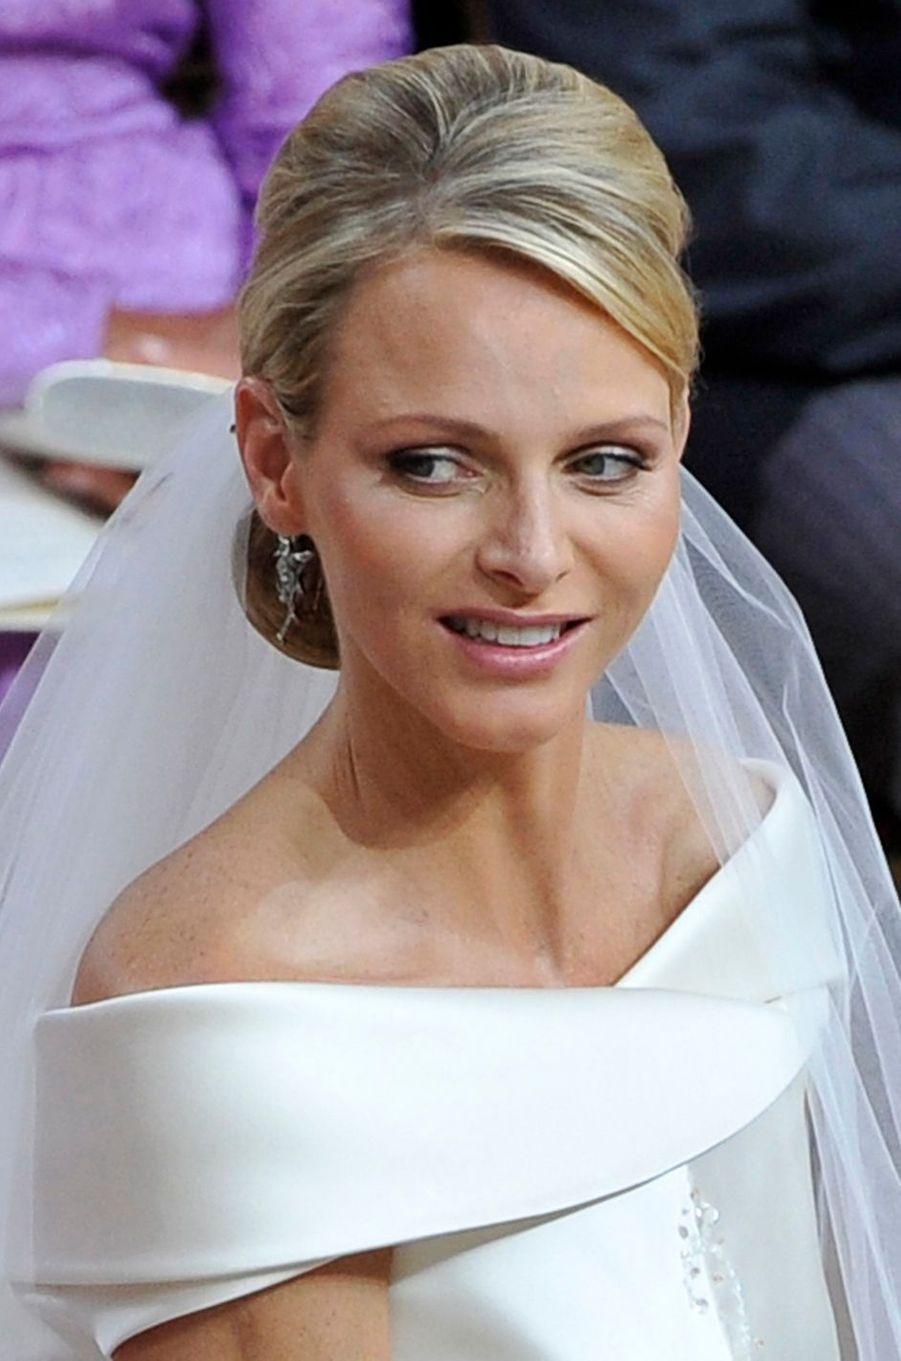 La princesse Charlène de Monaco, le 2 juillet 2011